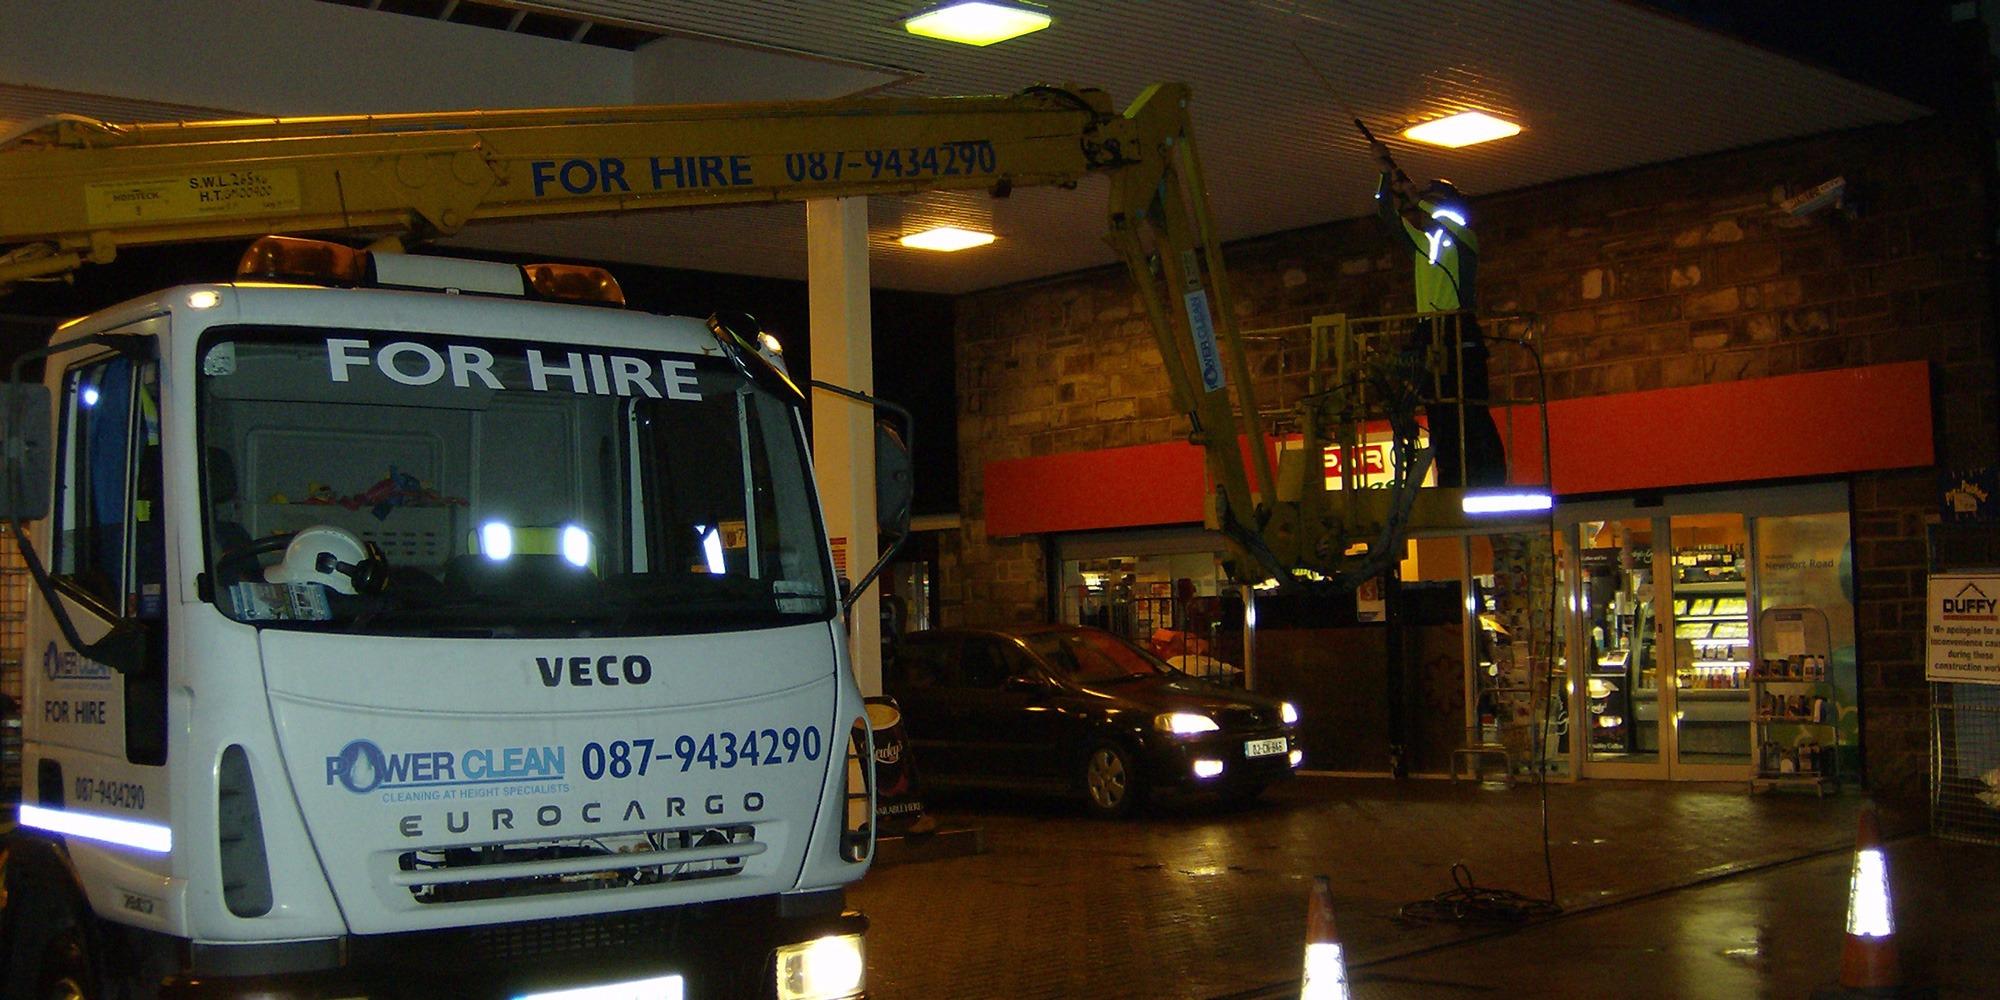 Petrol-Canopy-Cleaning-Service-Mayo,-Sligo,-Roscommon,-Galway-Ireland